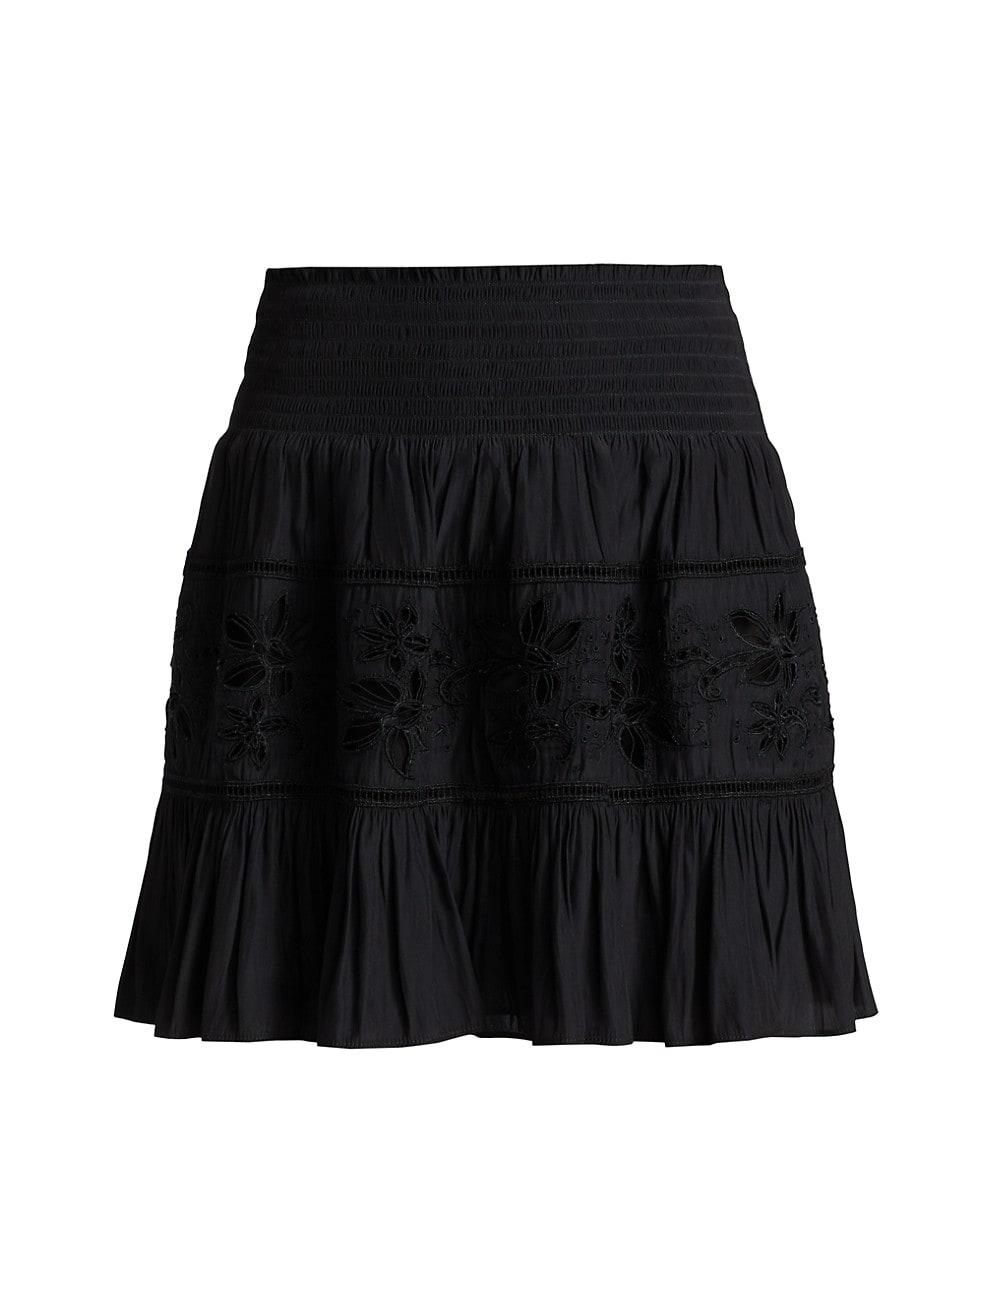 ramy brook skirt